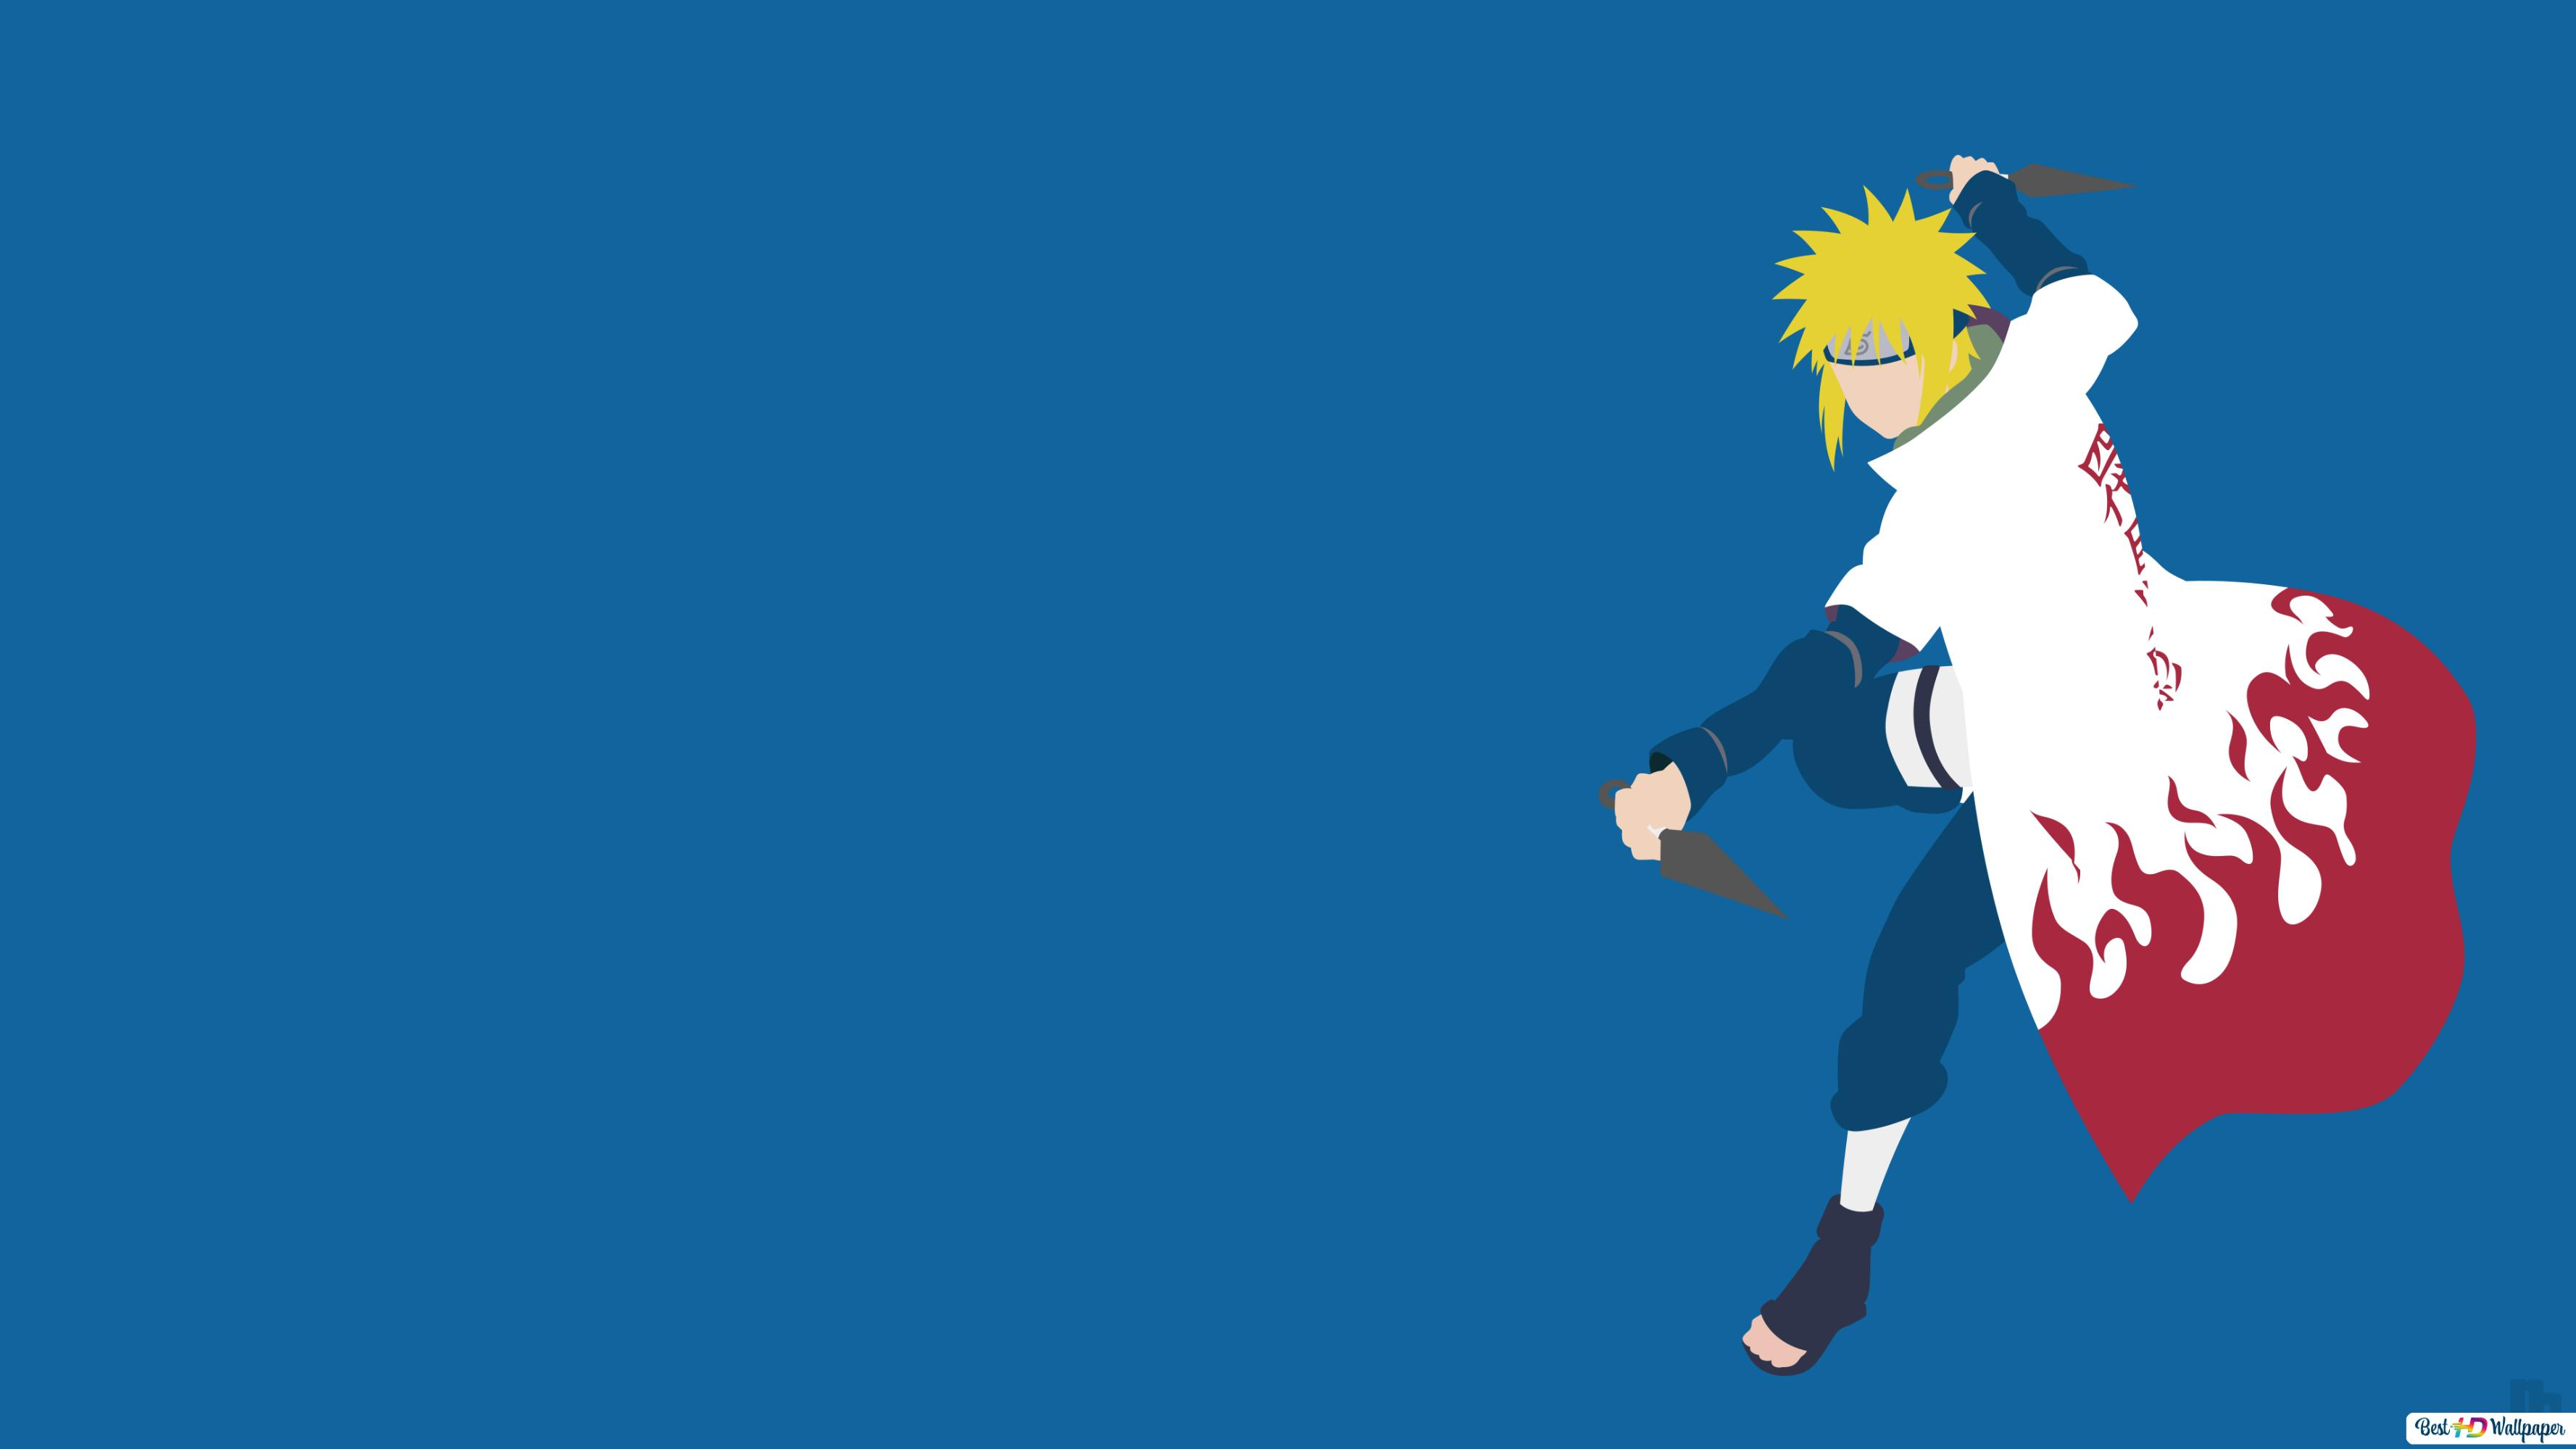 Minato Namikaze Of Naruto Hd Wallpaper Download